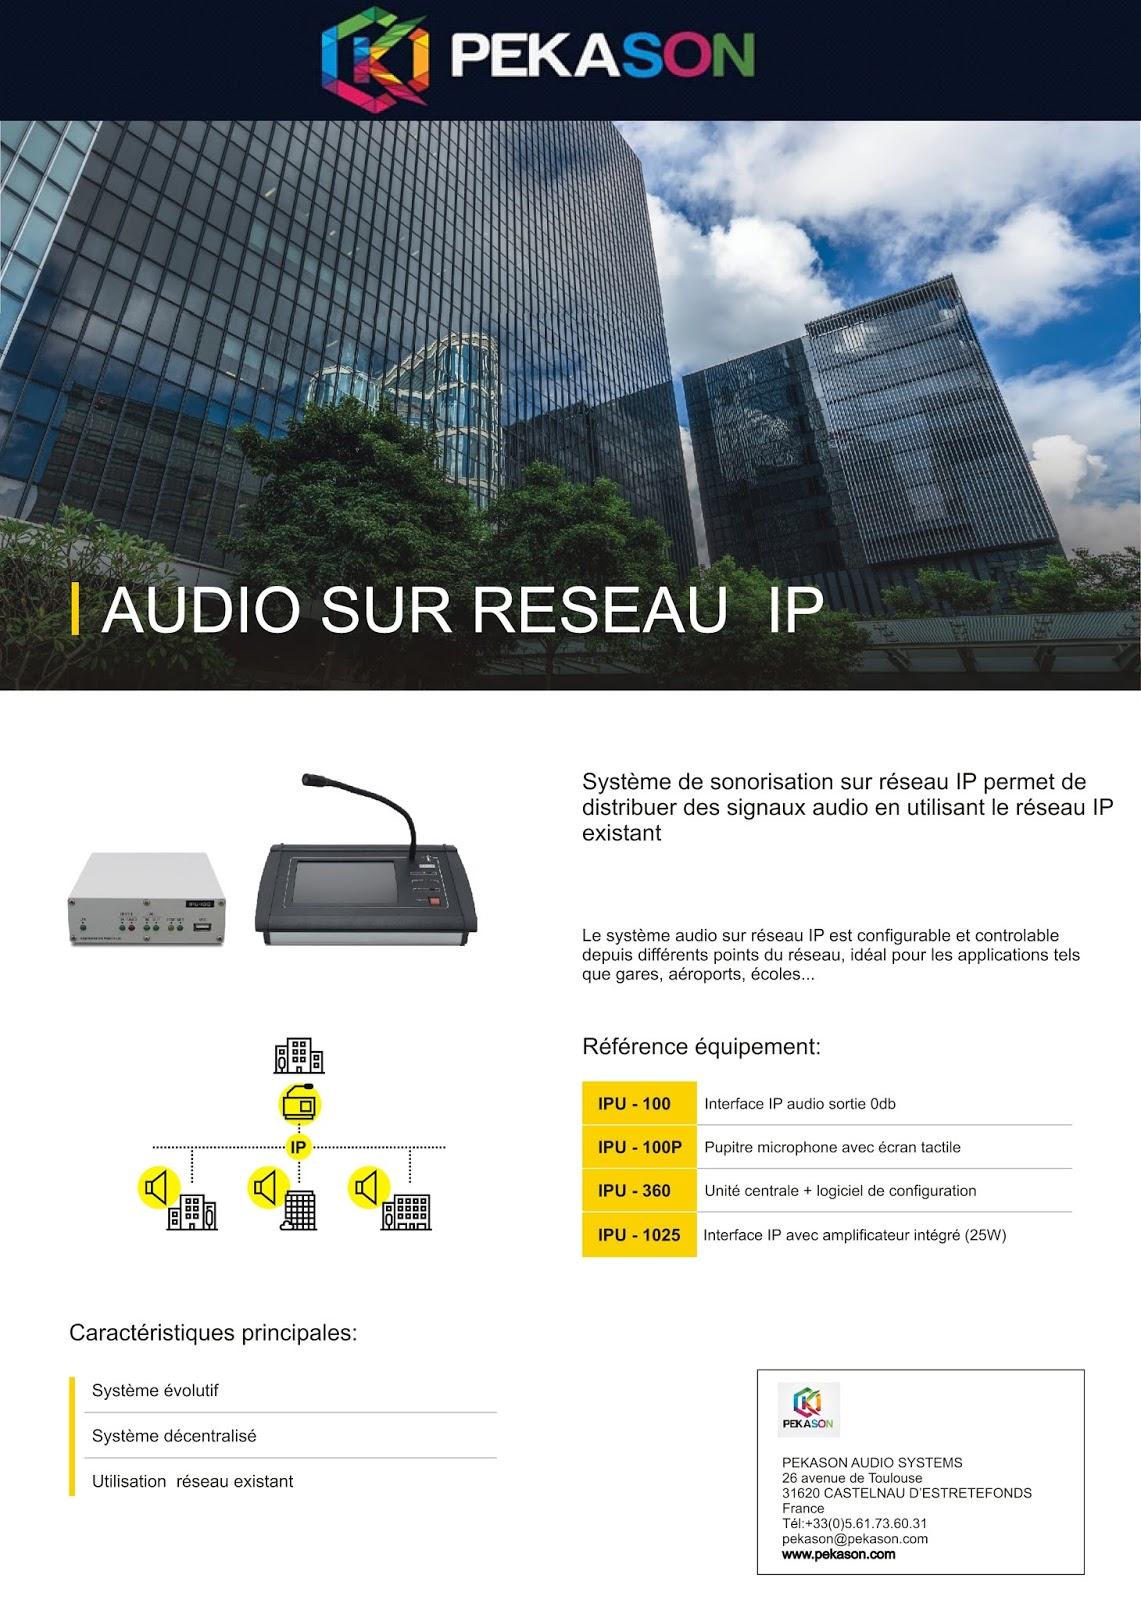 Sonorisation reseau IP